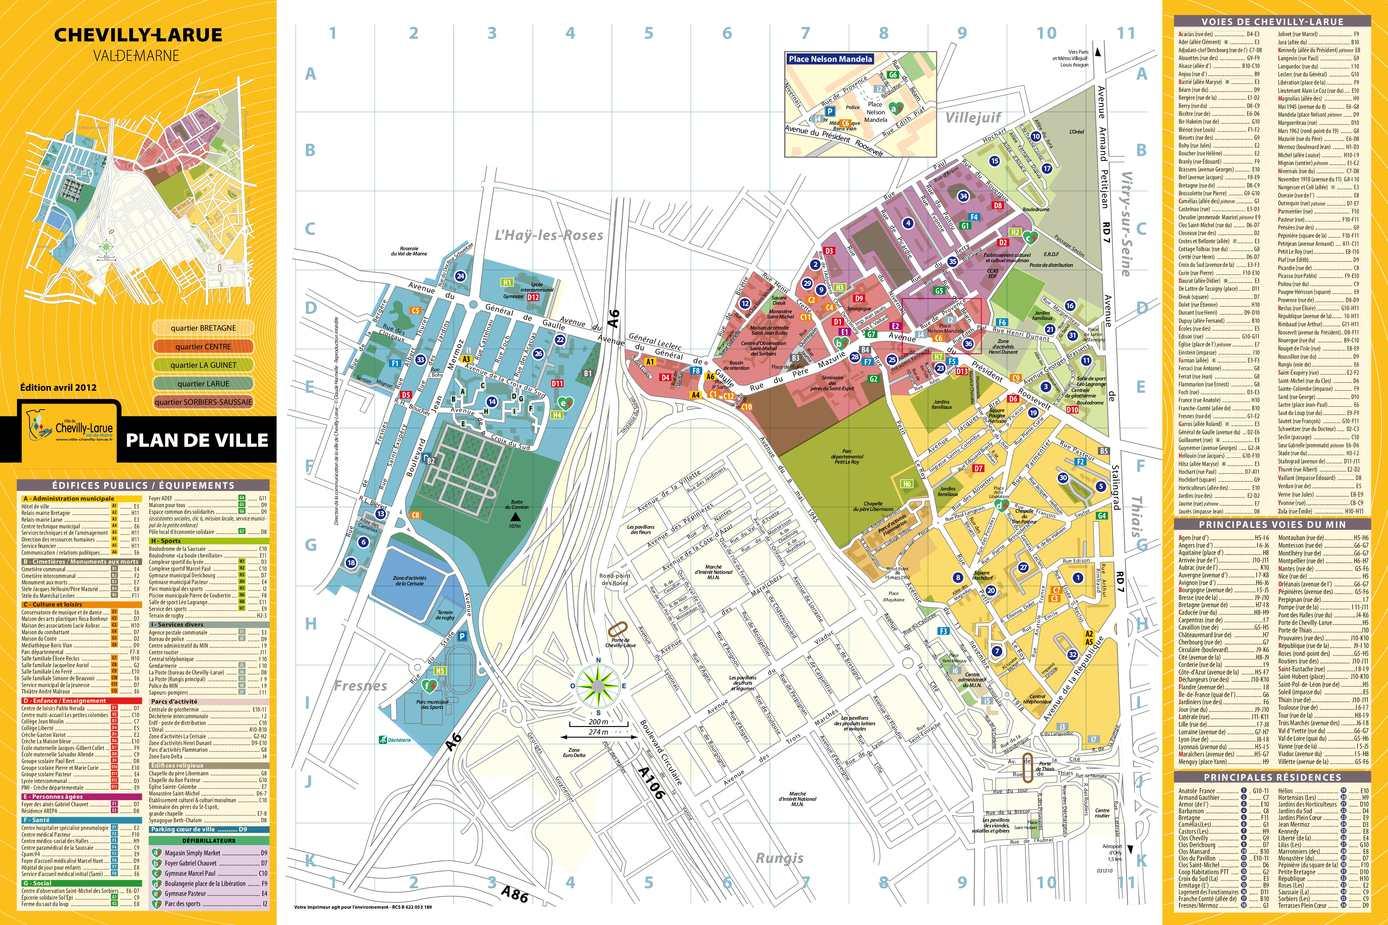 Calam o plan de la ville de chevilly larue for Chevilly larue piscine